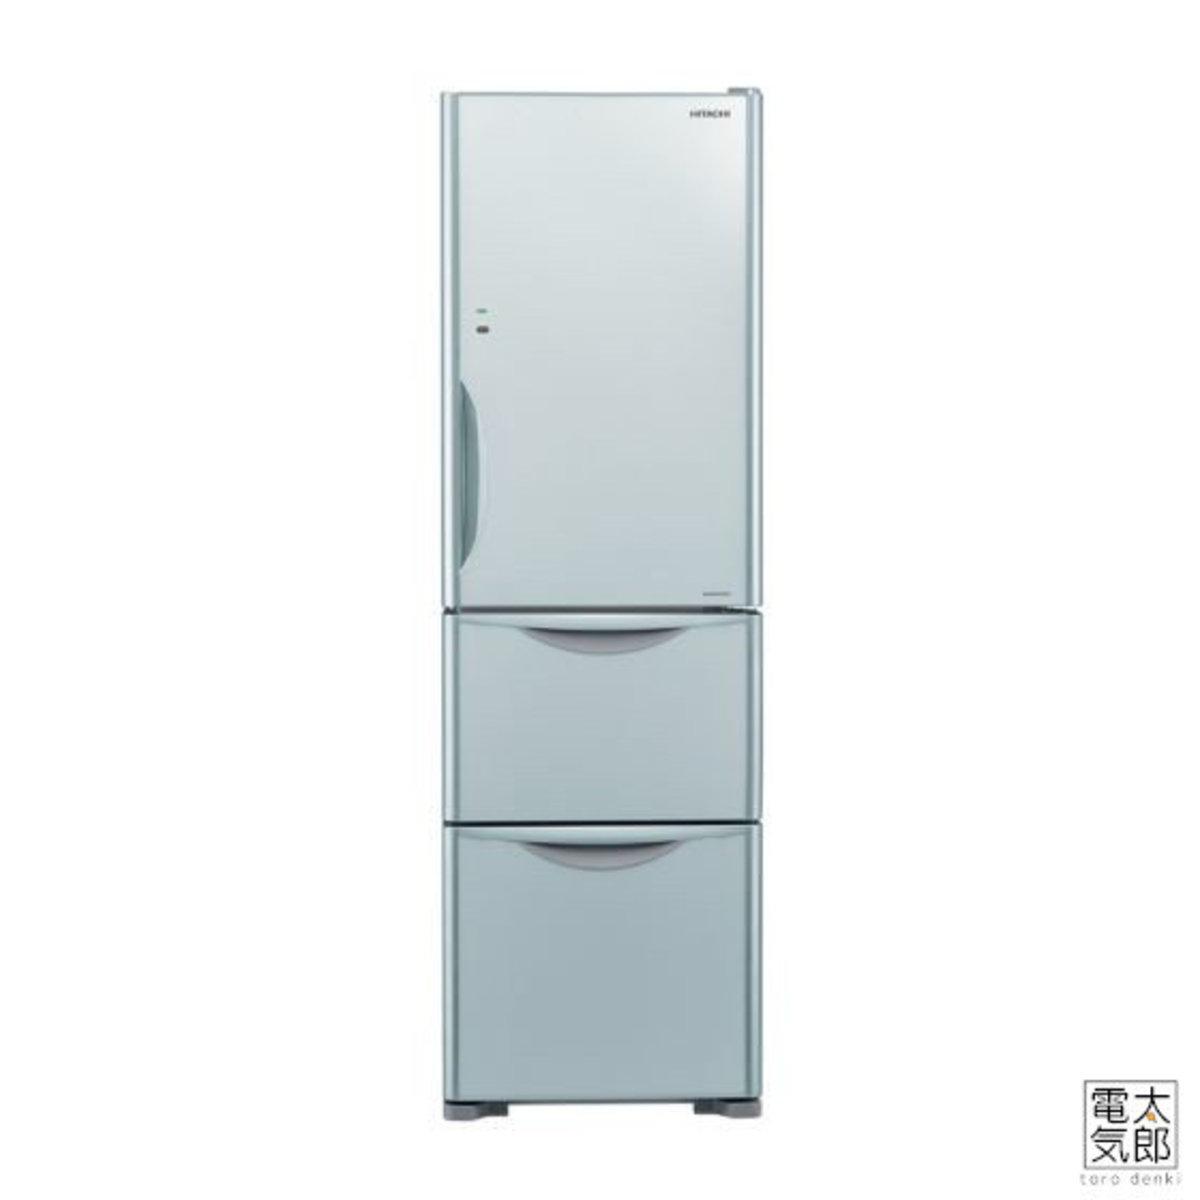 Hitachi - 3-Door Refrigerator Inverter Compressor Glass Silver RSG32KPH